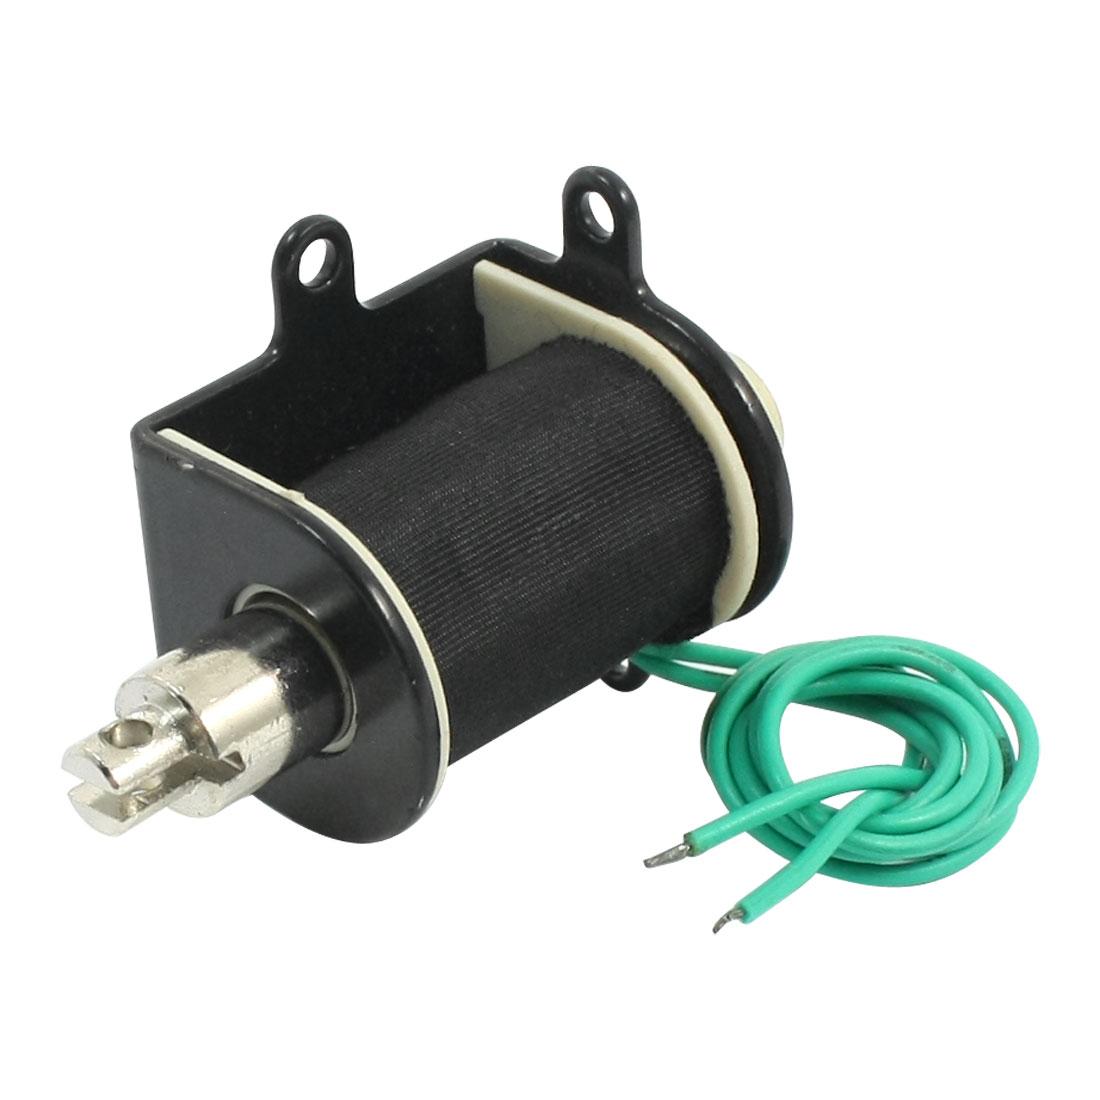 Pull Type Solenoid Electromagnet 110V 12.1W 10mm Stroke 150g Force